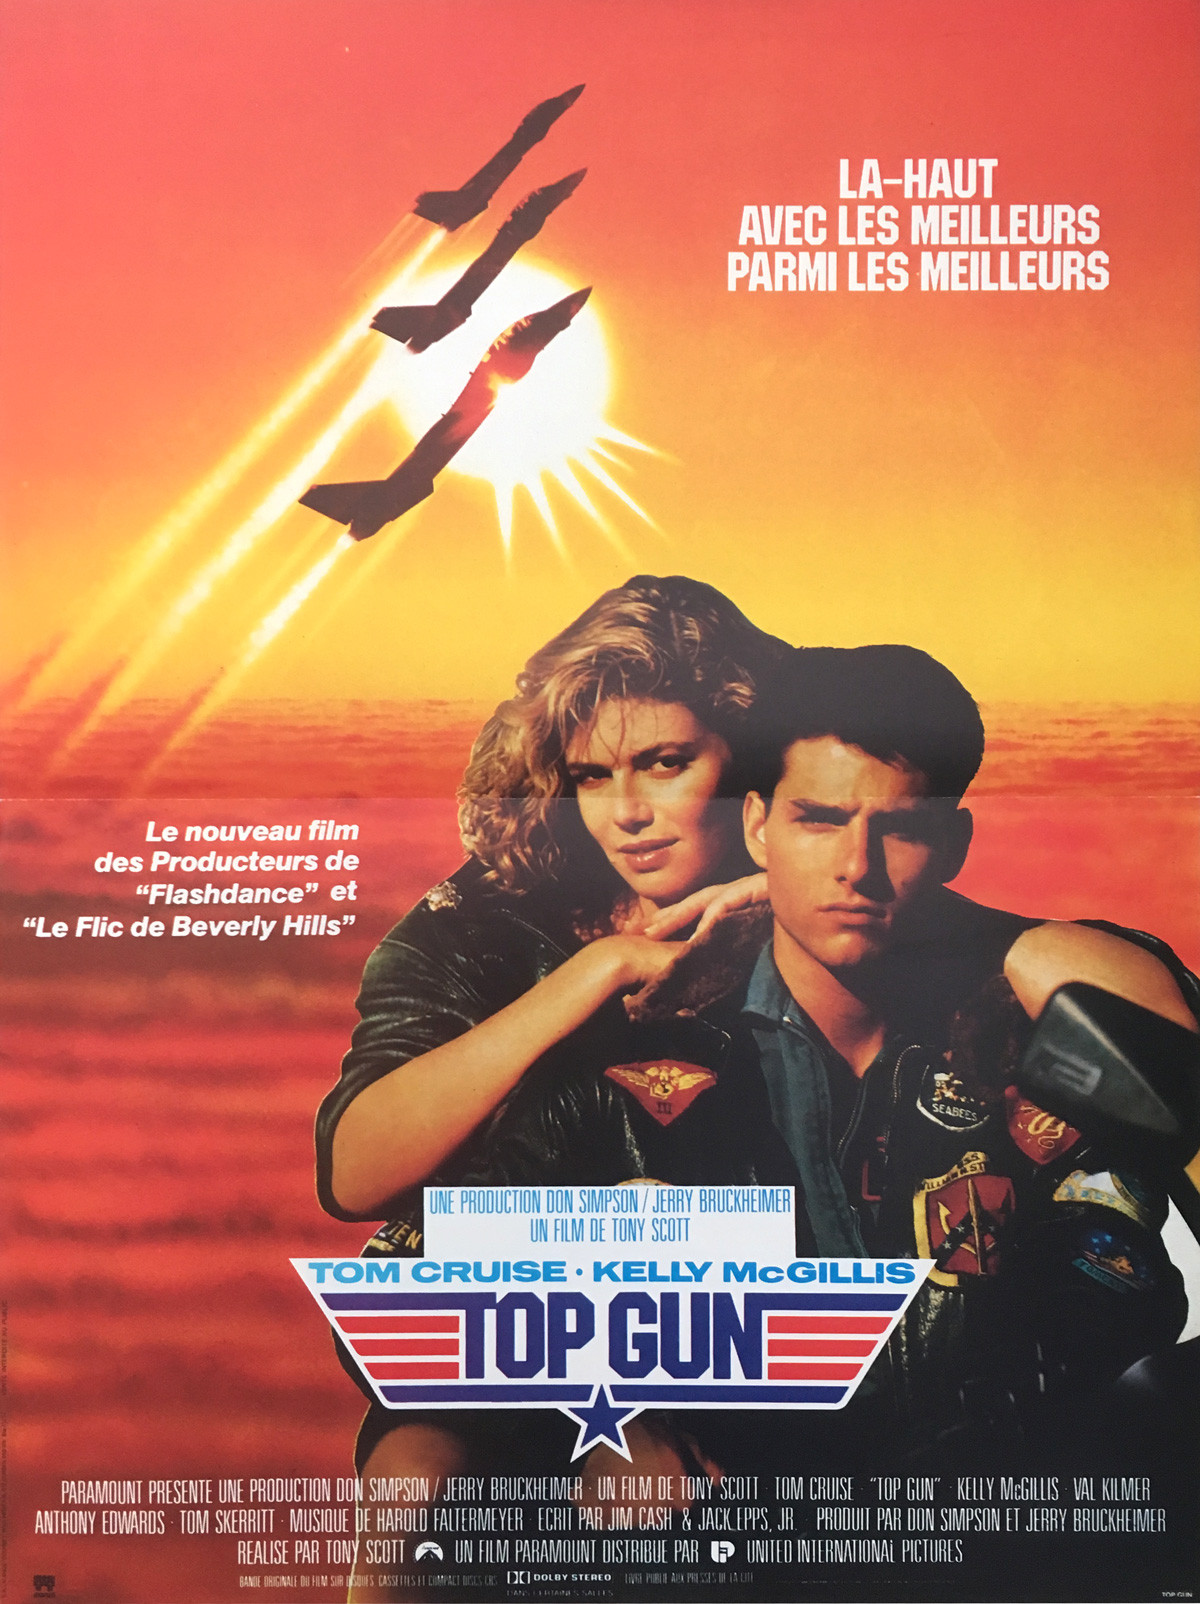 Top gun (1986) de Tony Scott